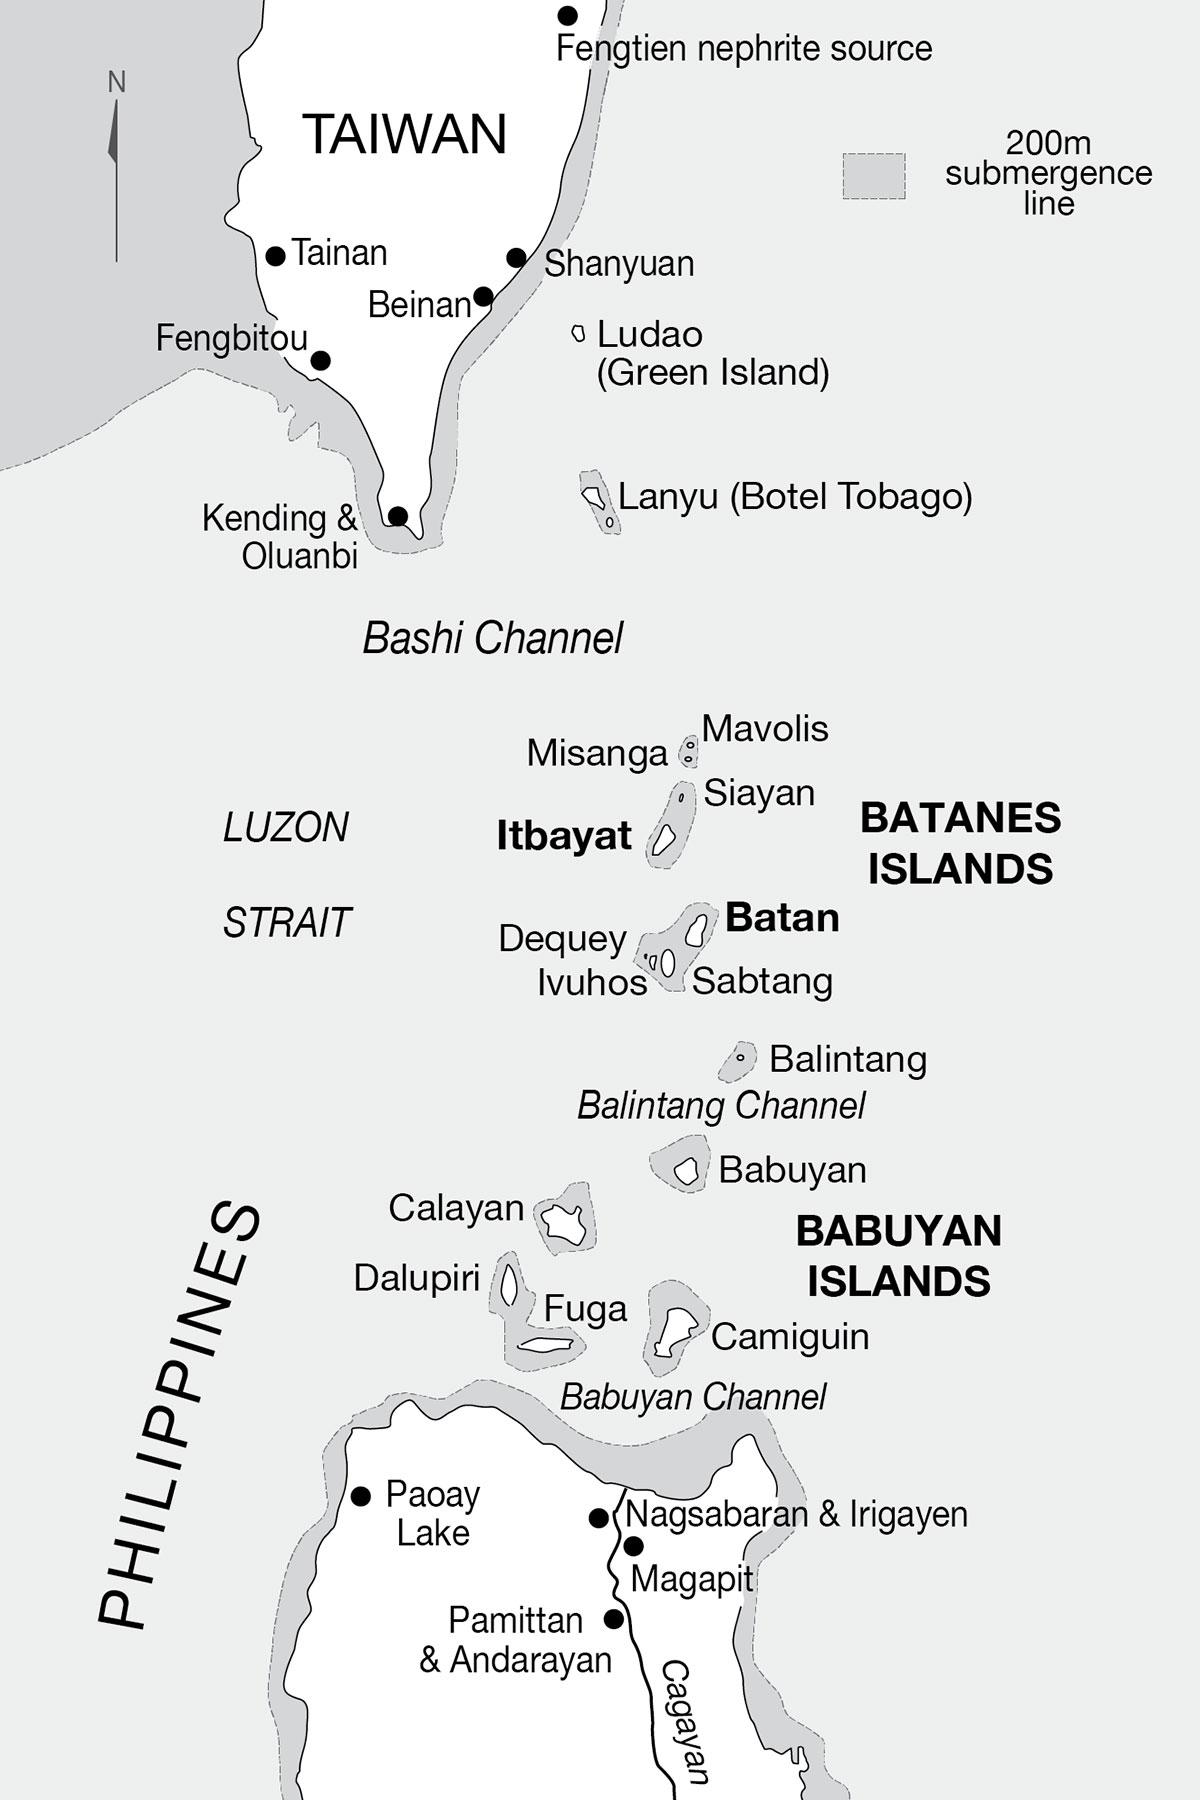 The Batanes Islands, staging grounds for the Austronesian diaspora - Peter Bellwood, Australia National University (ANU)